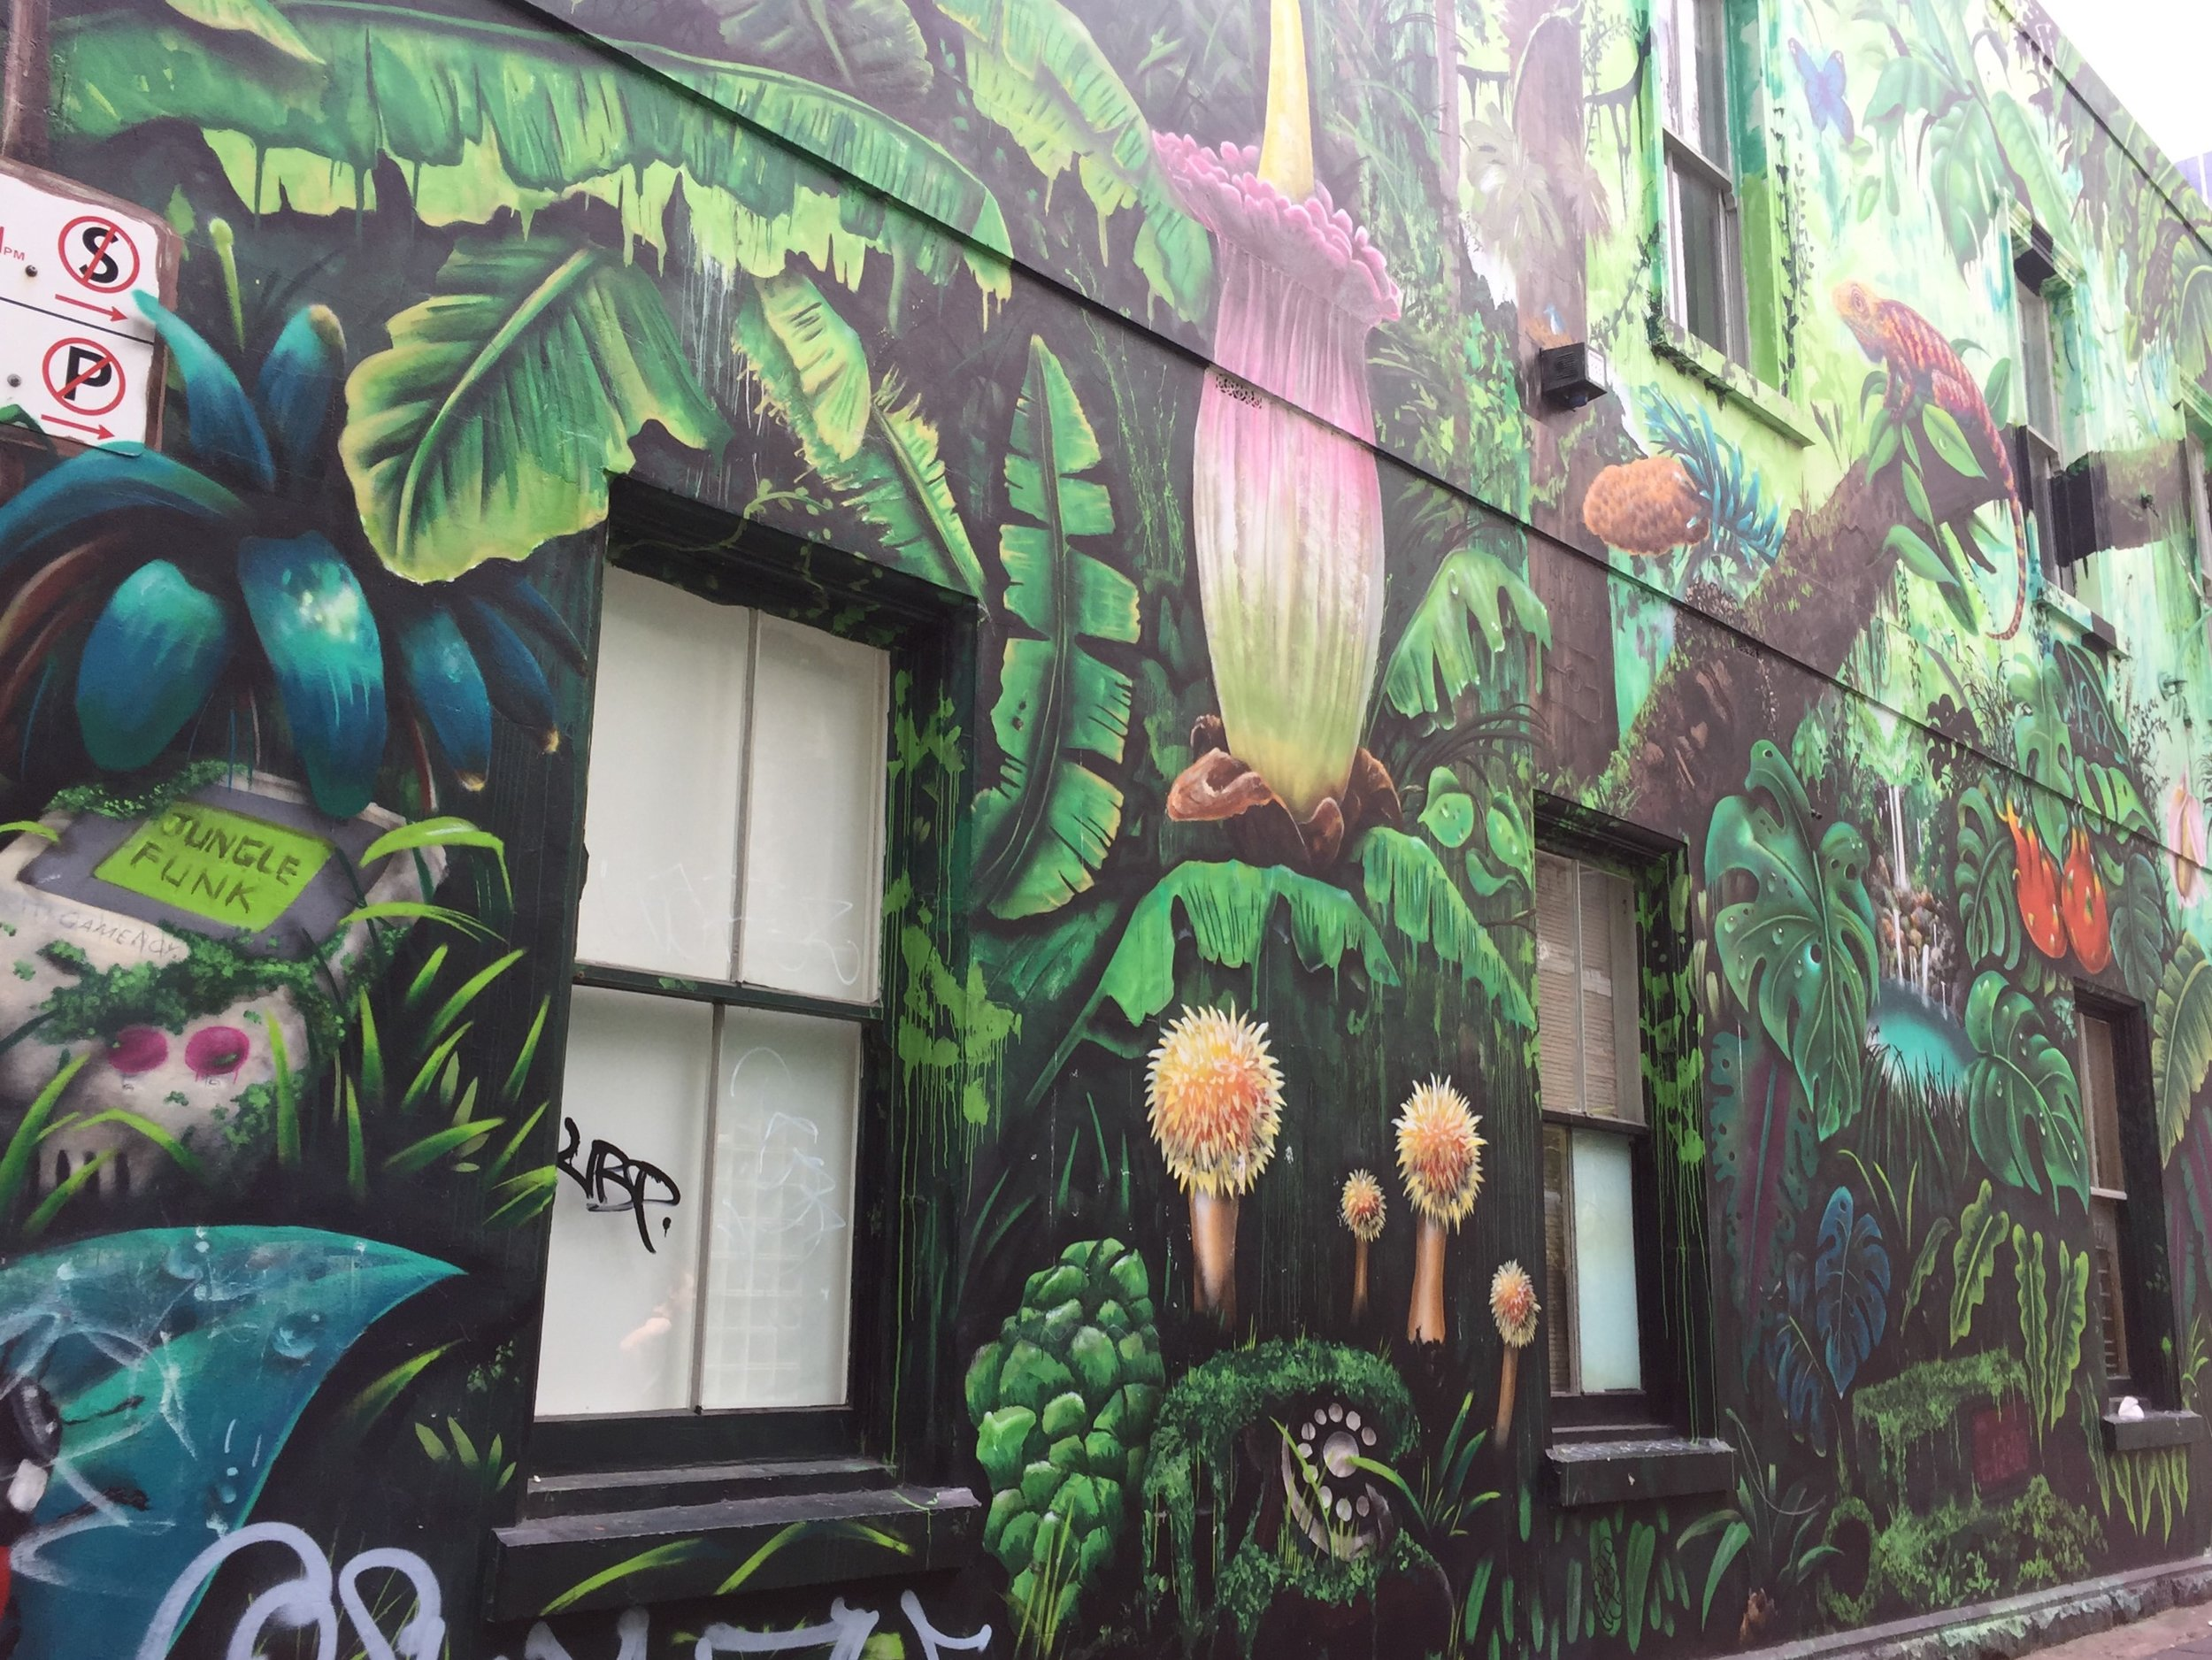 Melbourne Walking Tour-Melbourne Shopping Tour-Melbourne Shopping Experiences-Show Me Melbourne-Melbourne Street Art